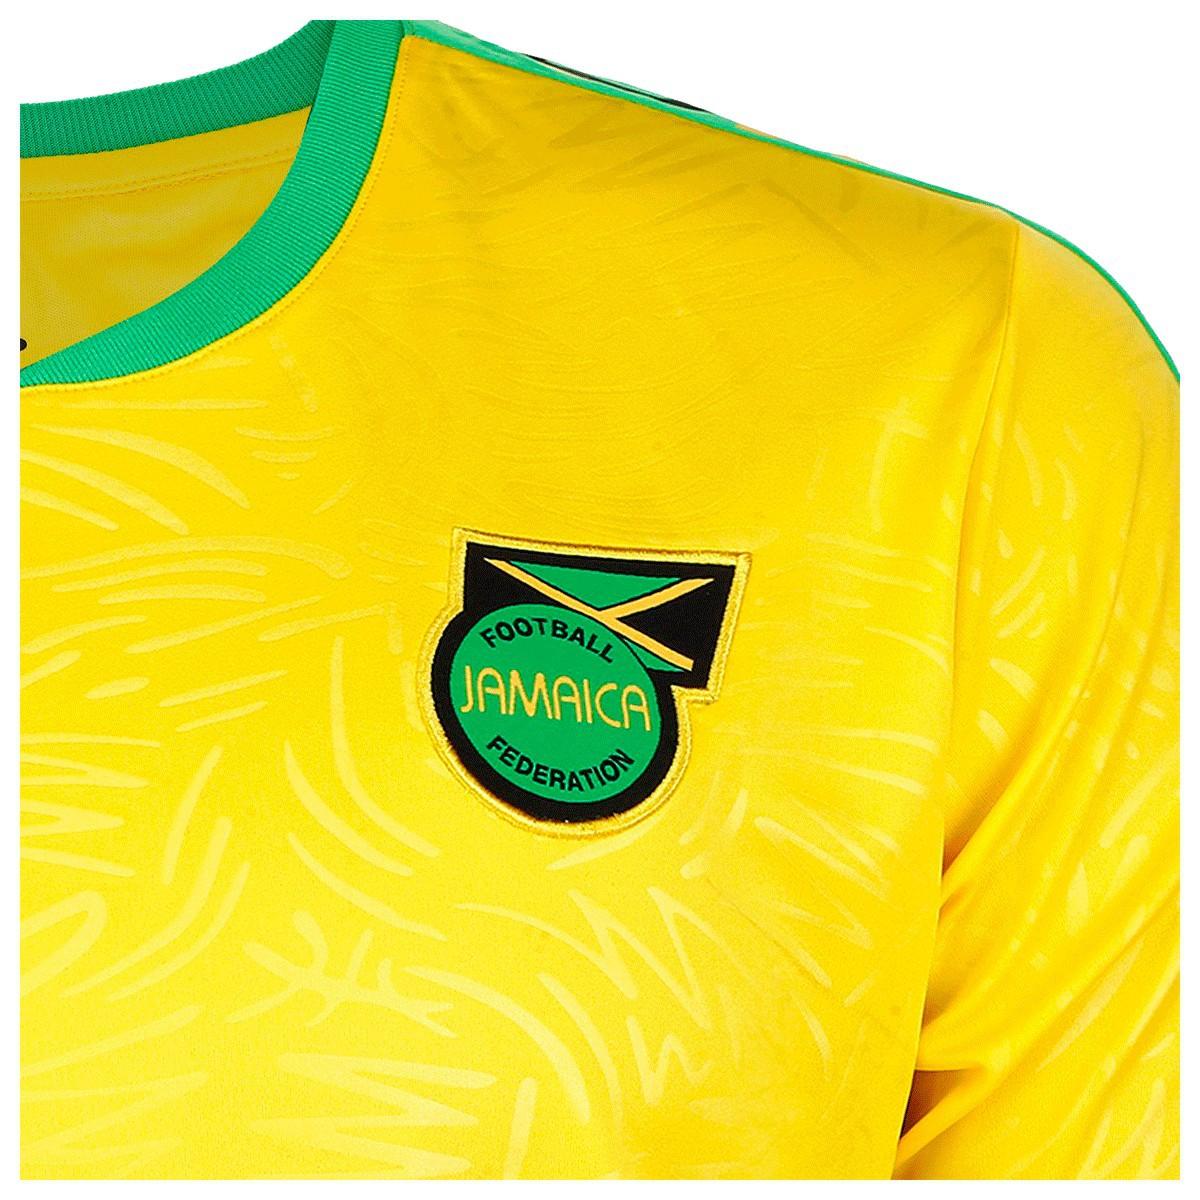 Camisa Jamaica Umbro Home Jersey 19 20